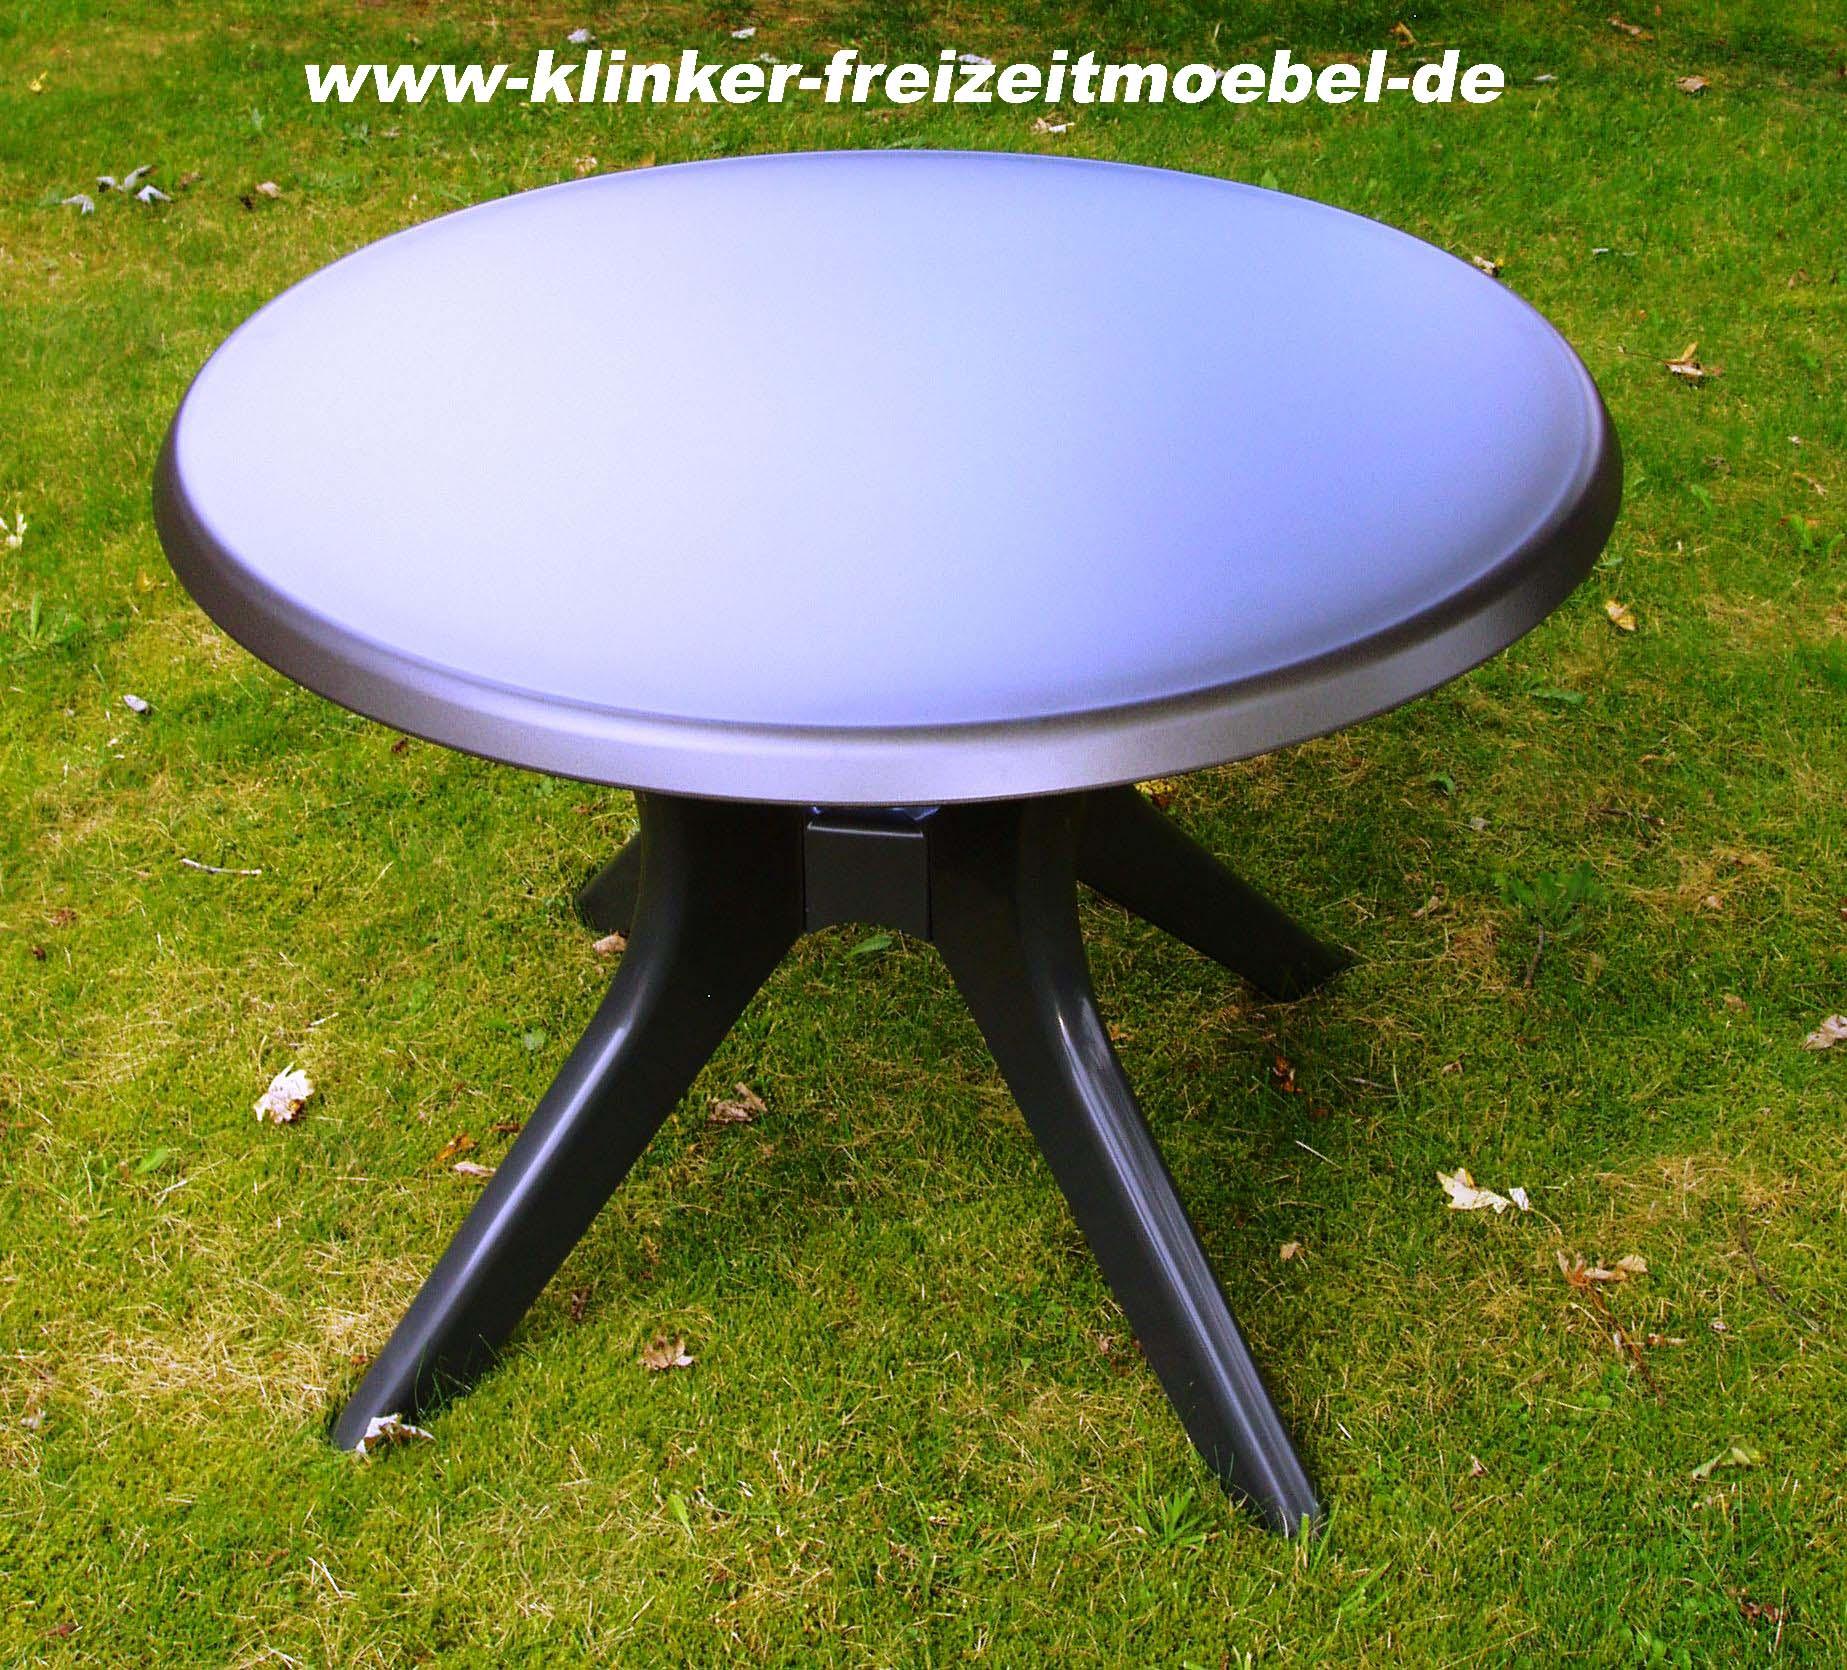 kettler tisch kettalux plus nanoclean neu frei haus top ebay. Black Bedroom Furniture Sets. Home Design Ideas